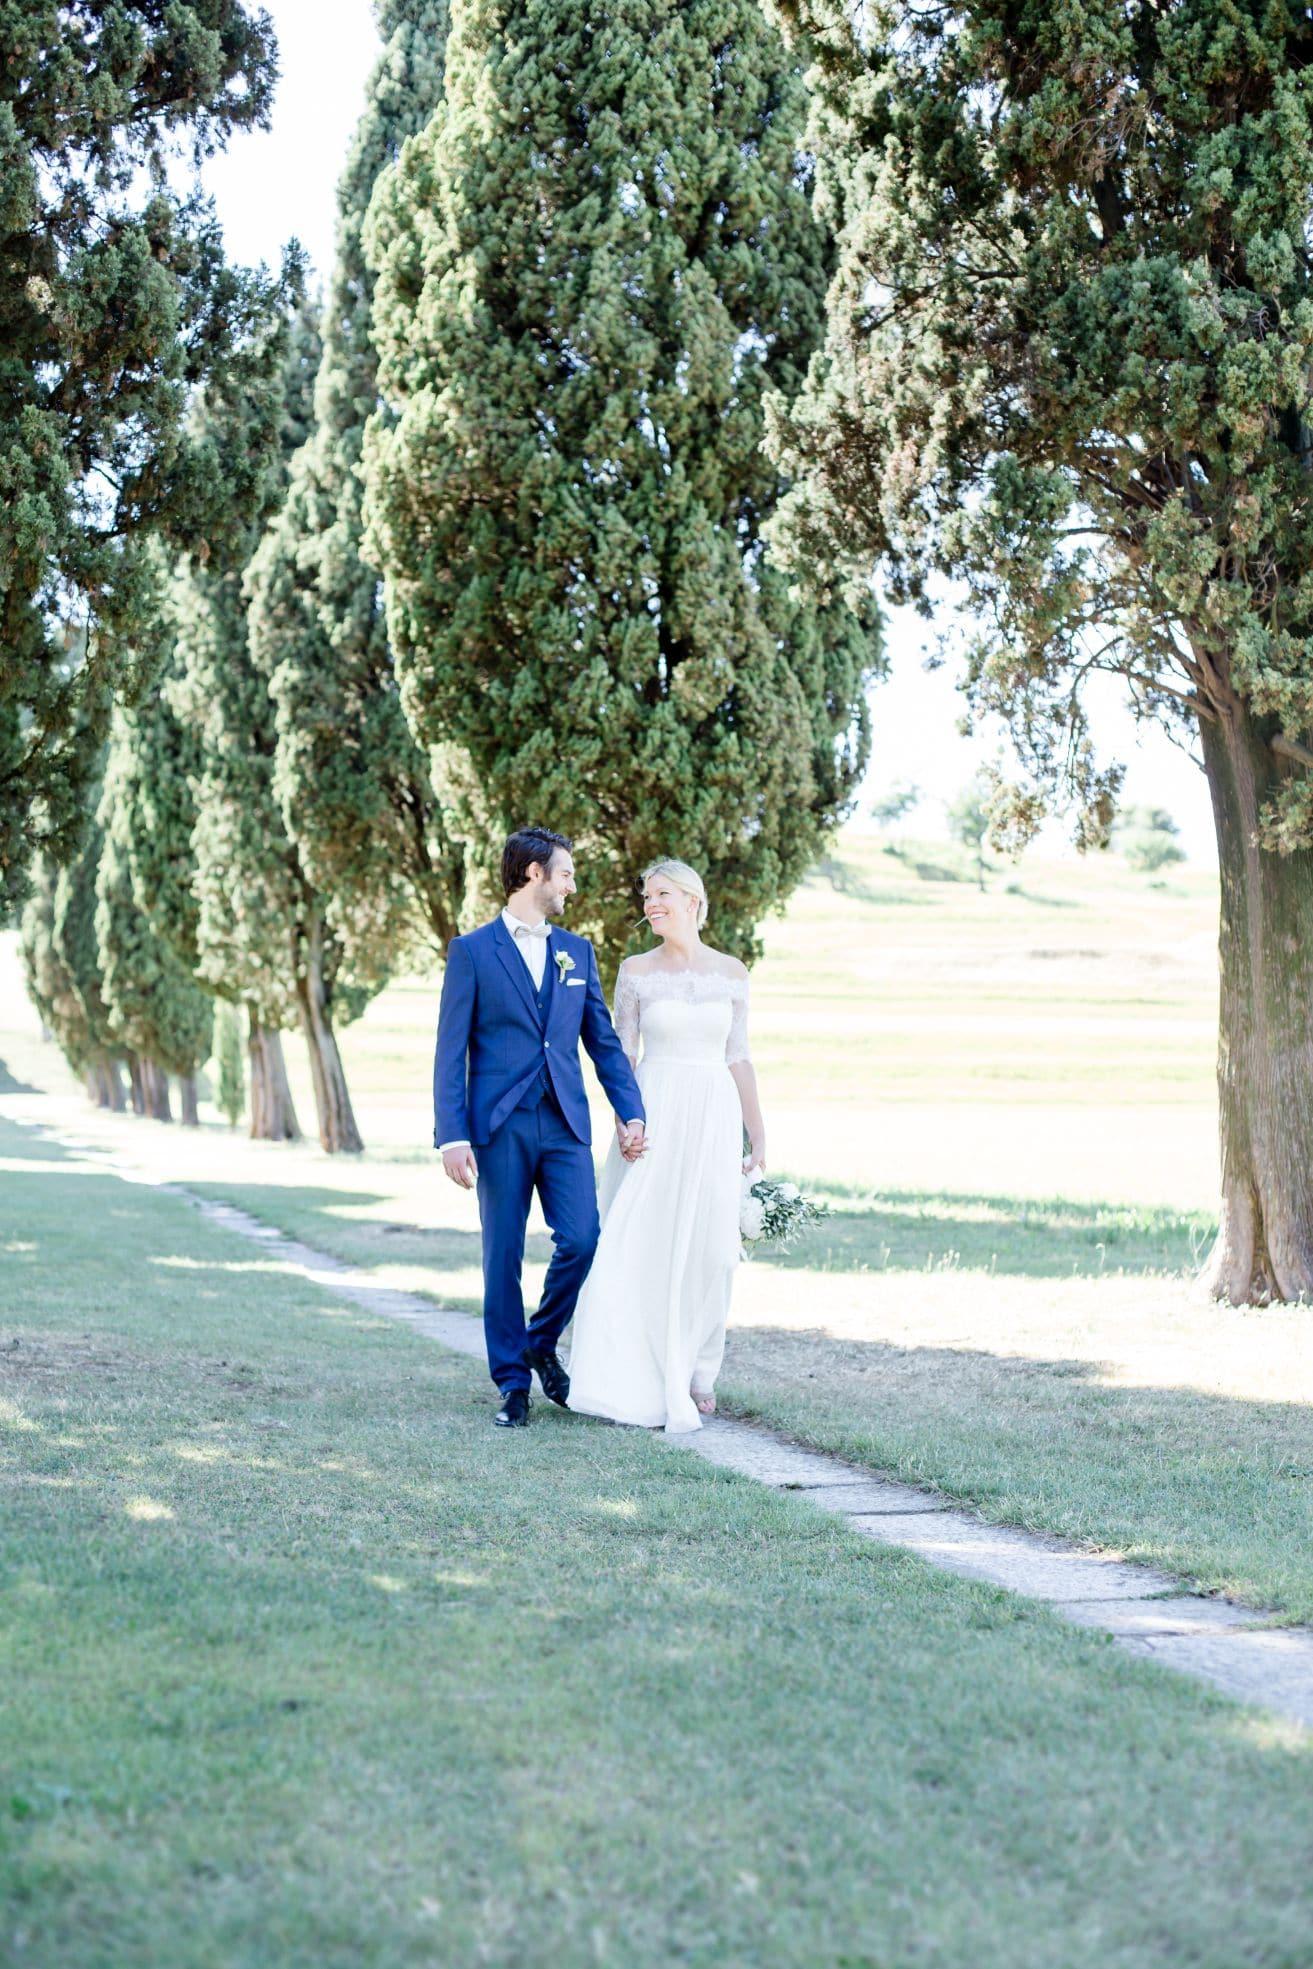 Million Memories_A&D_Hochzeitsfotograf_Schlosshochzeit_Toskana_Lago Di Como_Wedding_Tuscany_097